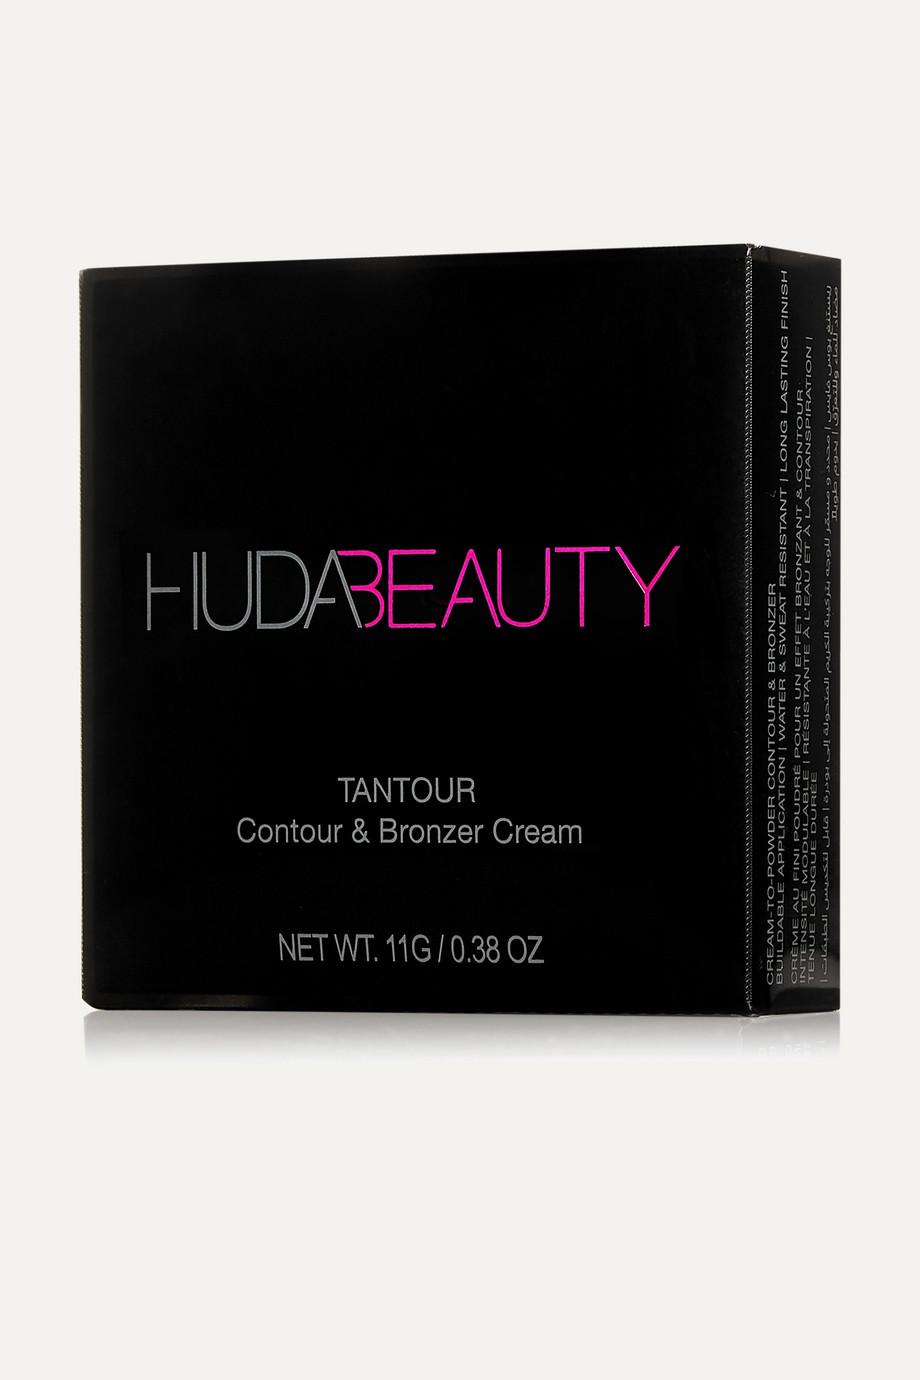 Huda Beauty Tantour Contour & Bronzer Cream - Fair